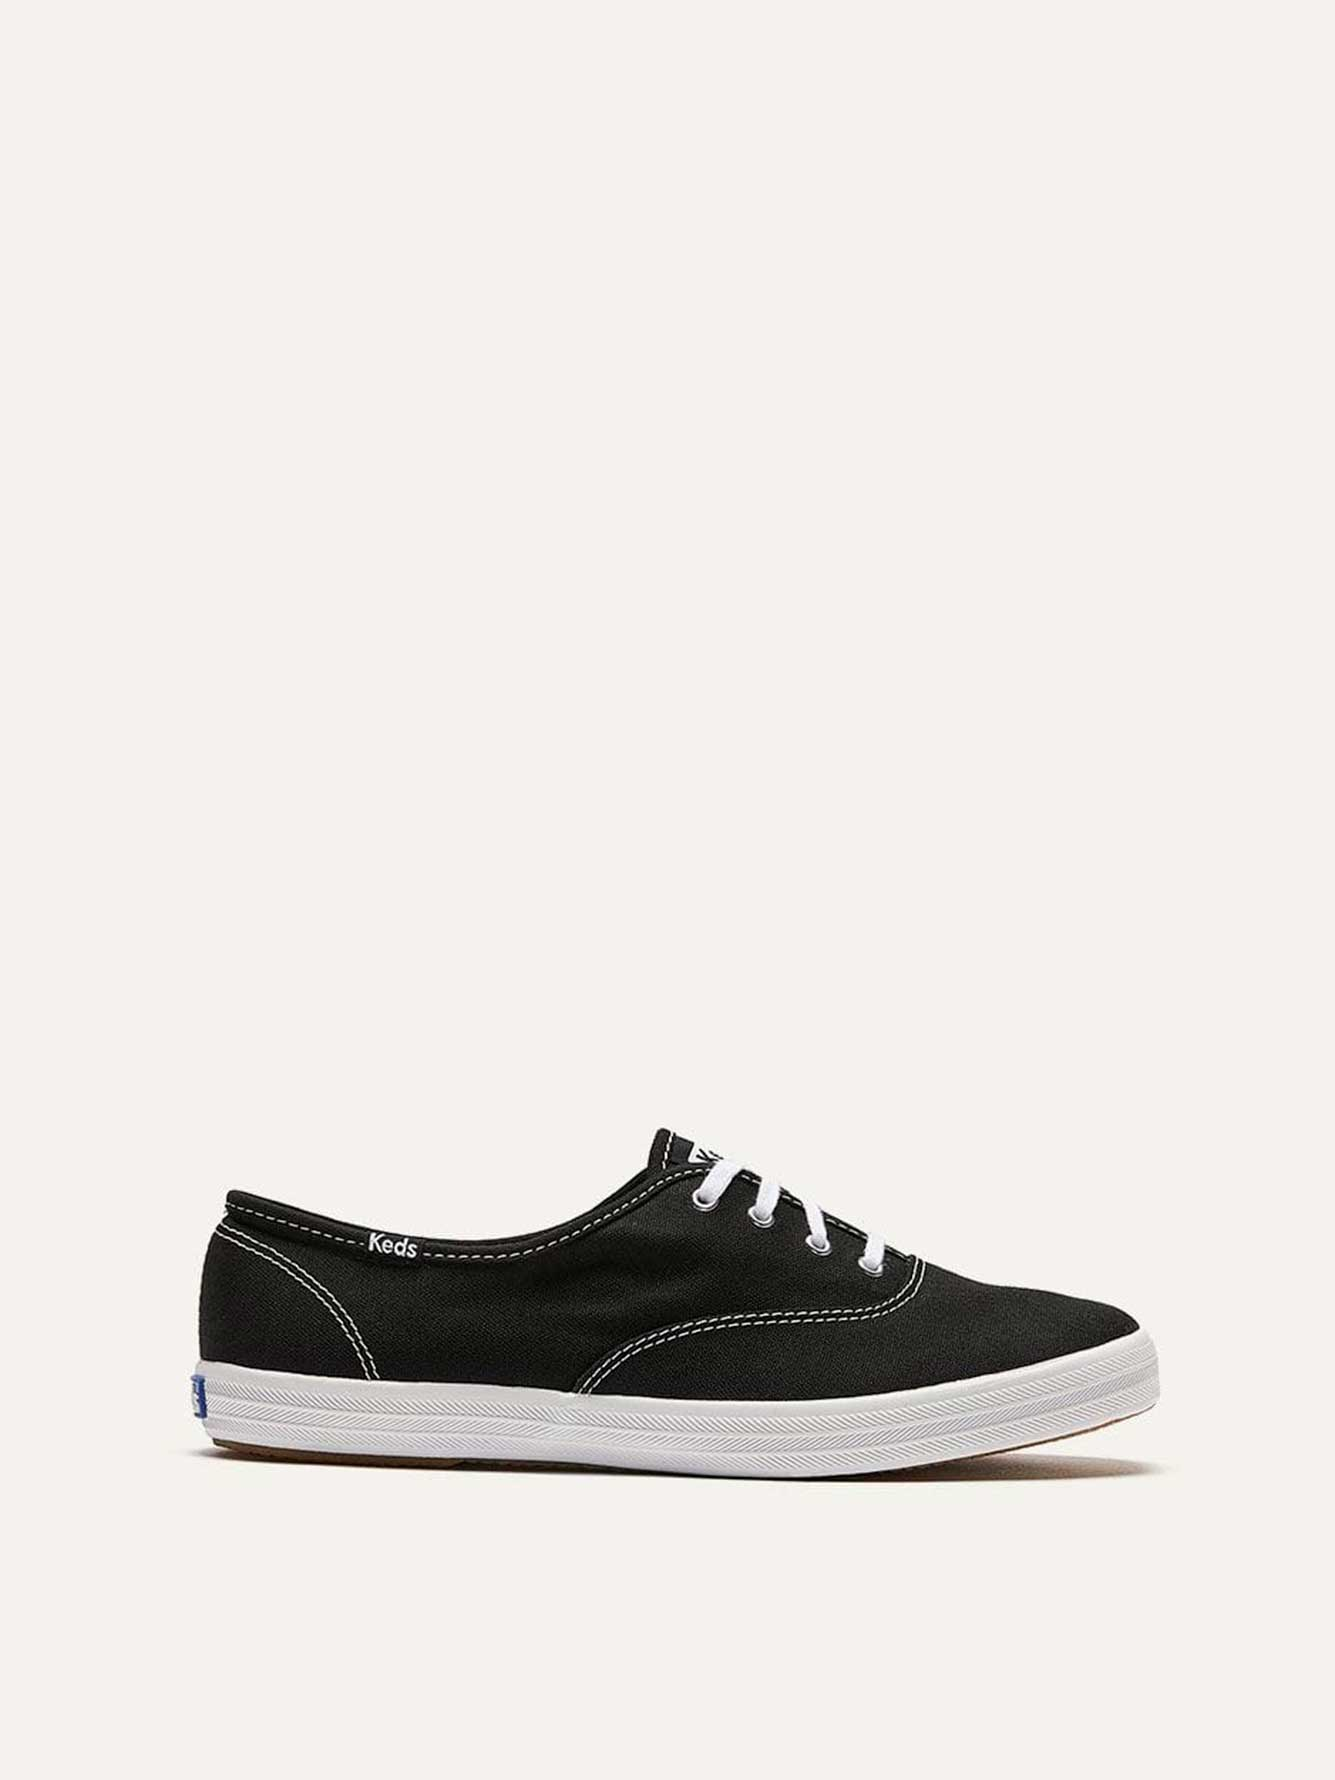 fb8cac0c19e59 Wide Champion Oxford Canvas Shoes - Keds | Penningtons